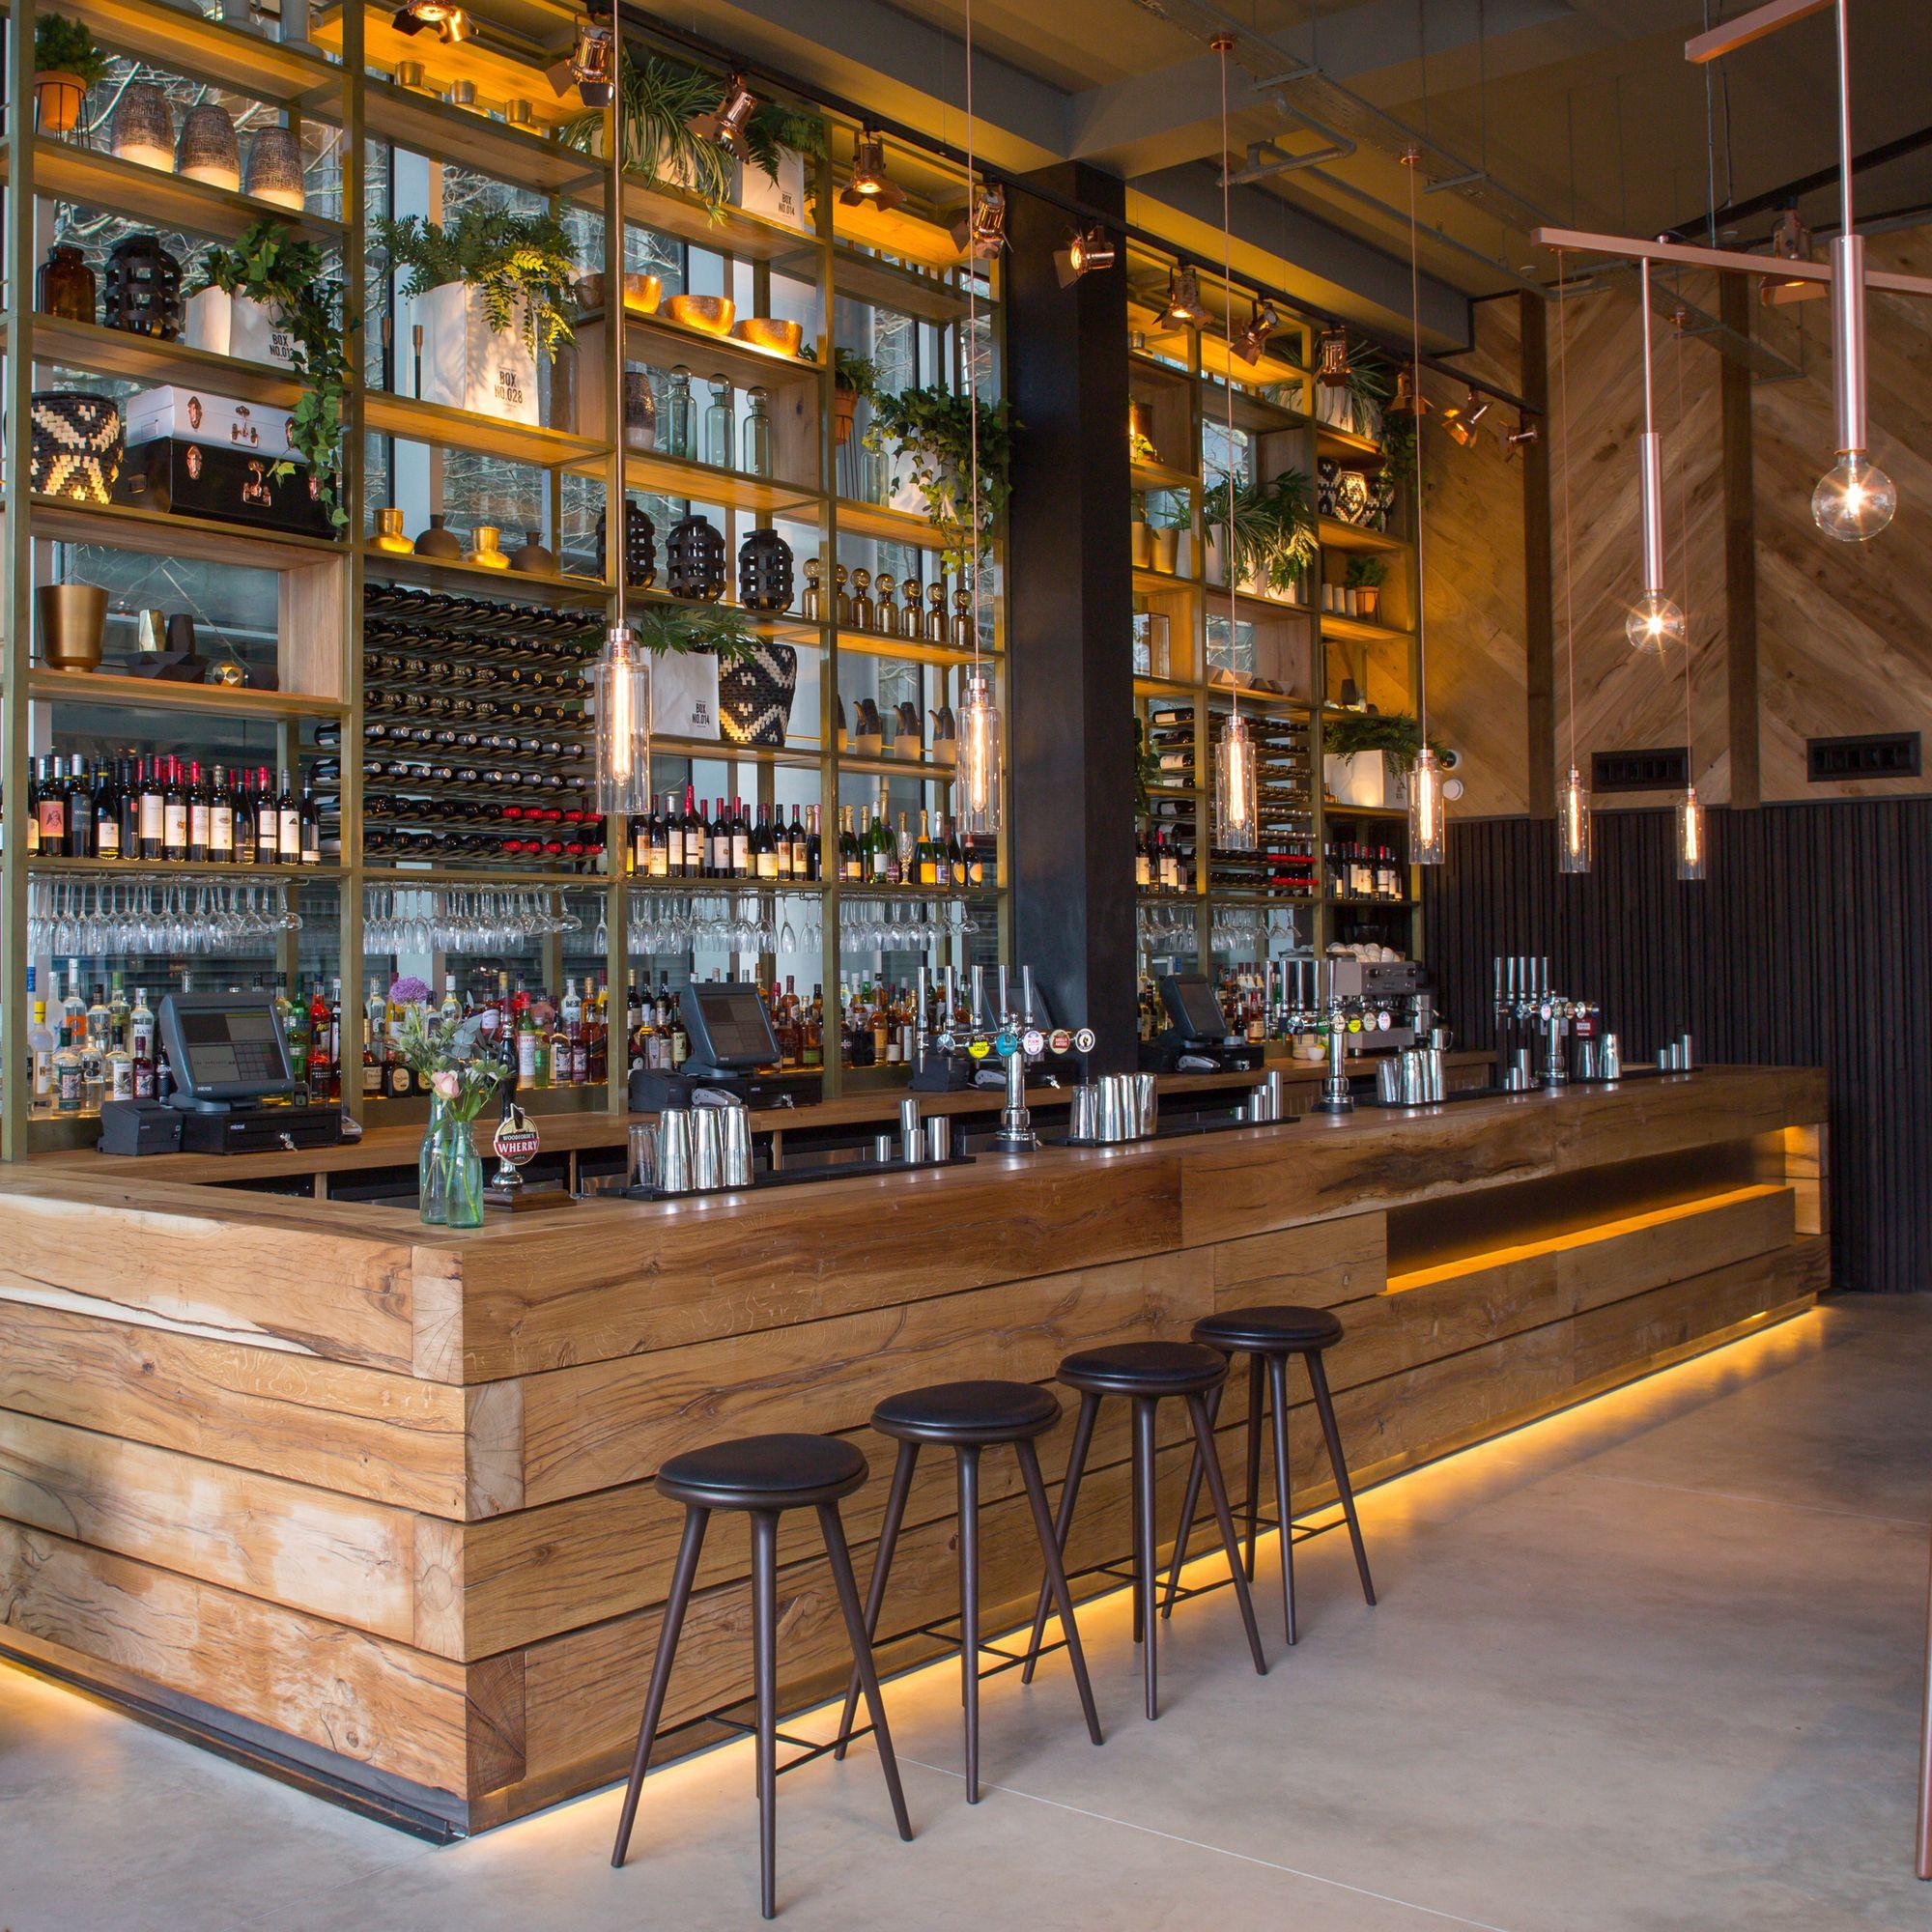 Gallery of 2016 Restaurant  Bar Design Awards Announced